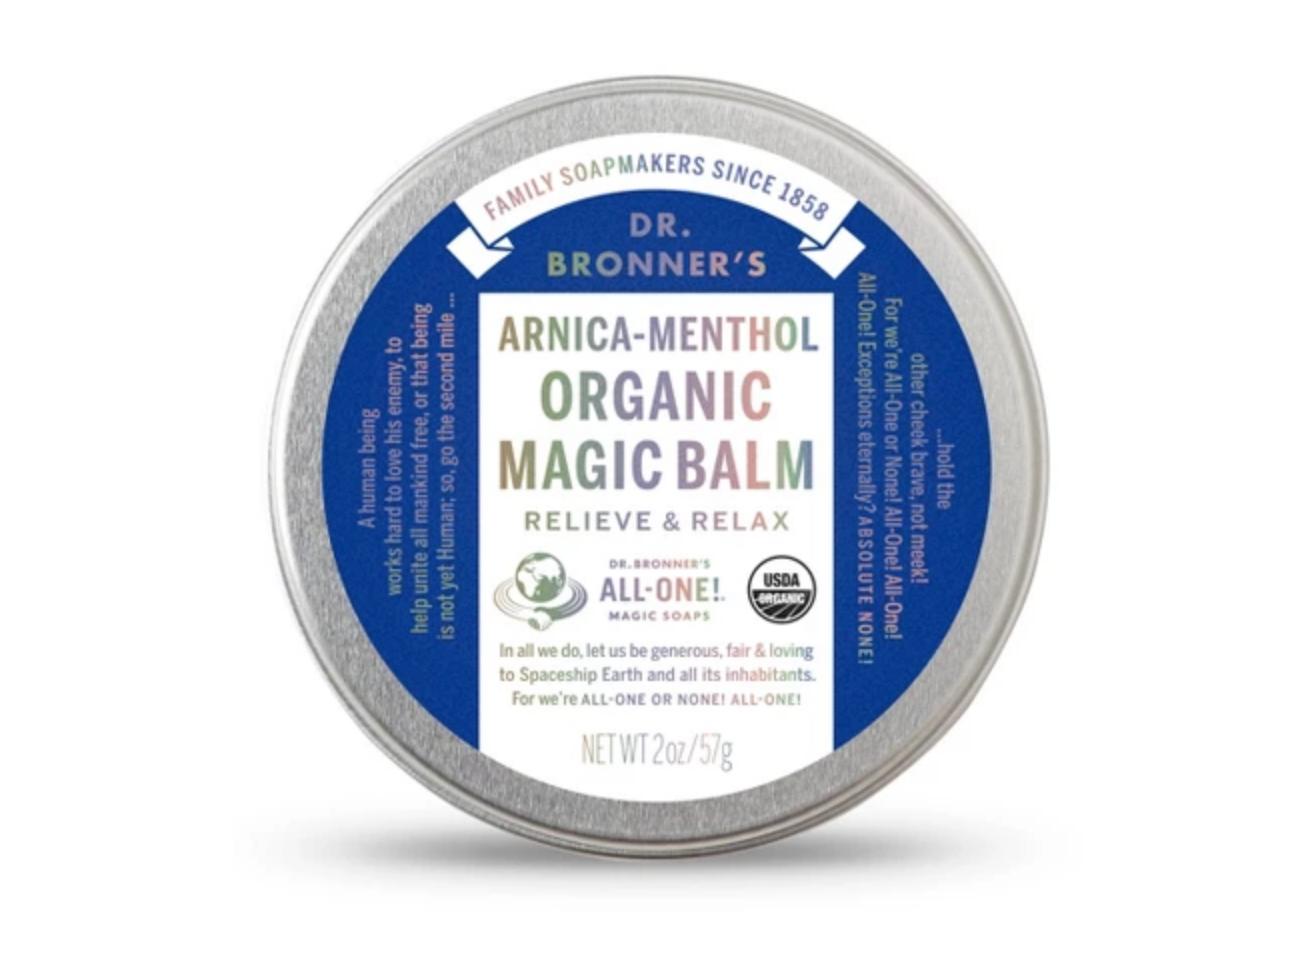 Dr. Bronner's Arnica Menthol Magic Balm - 2oz